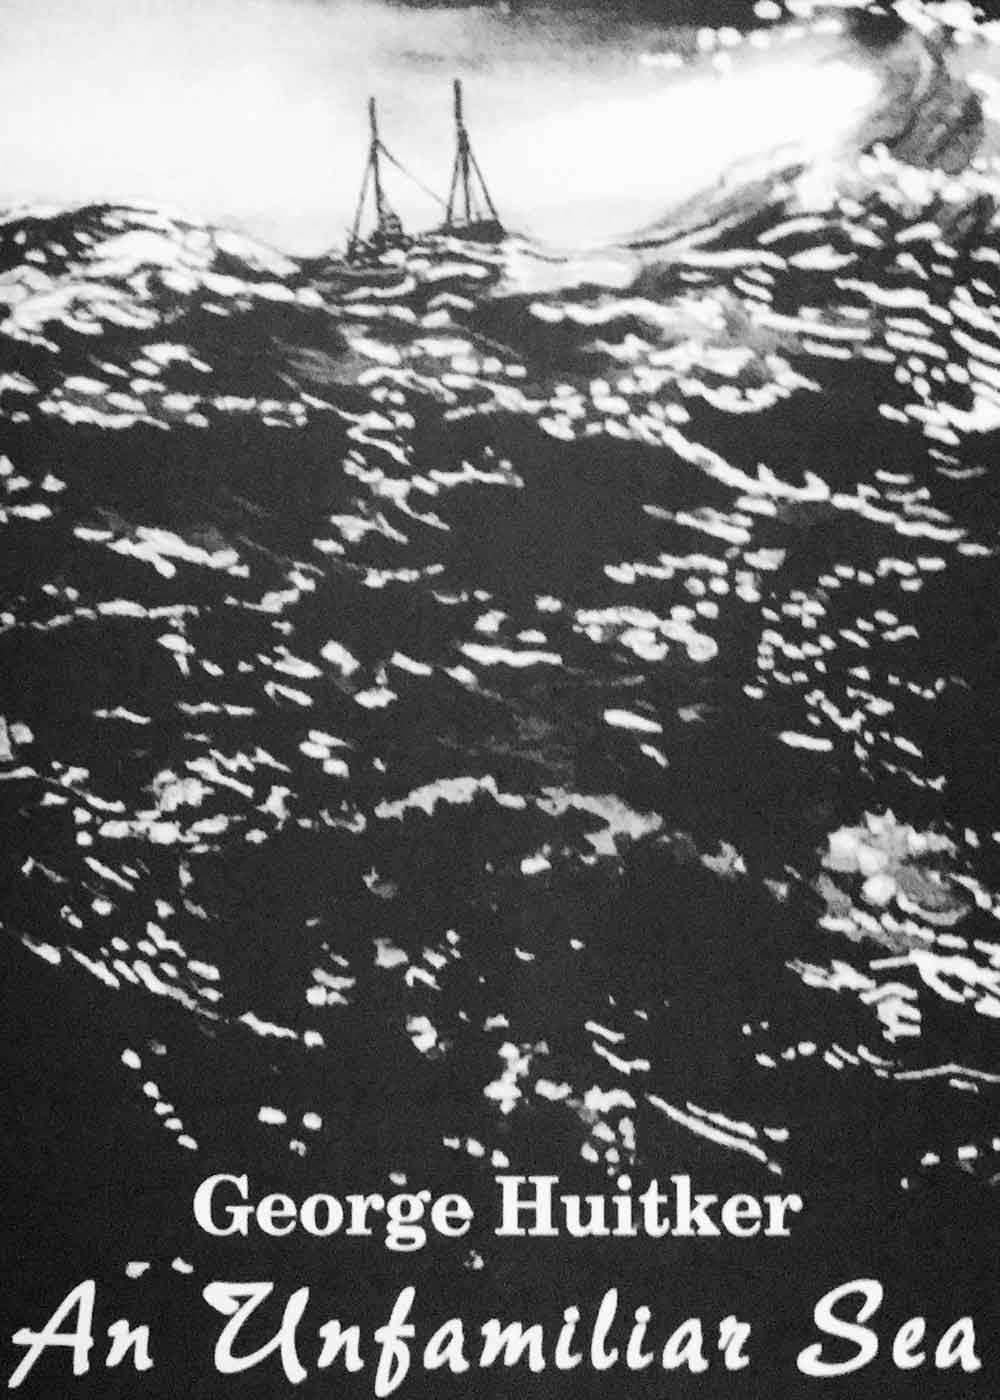 An Unfamiliar Sea book cover.